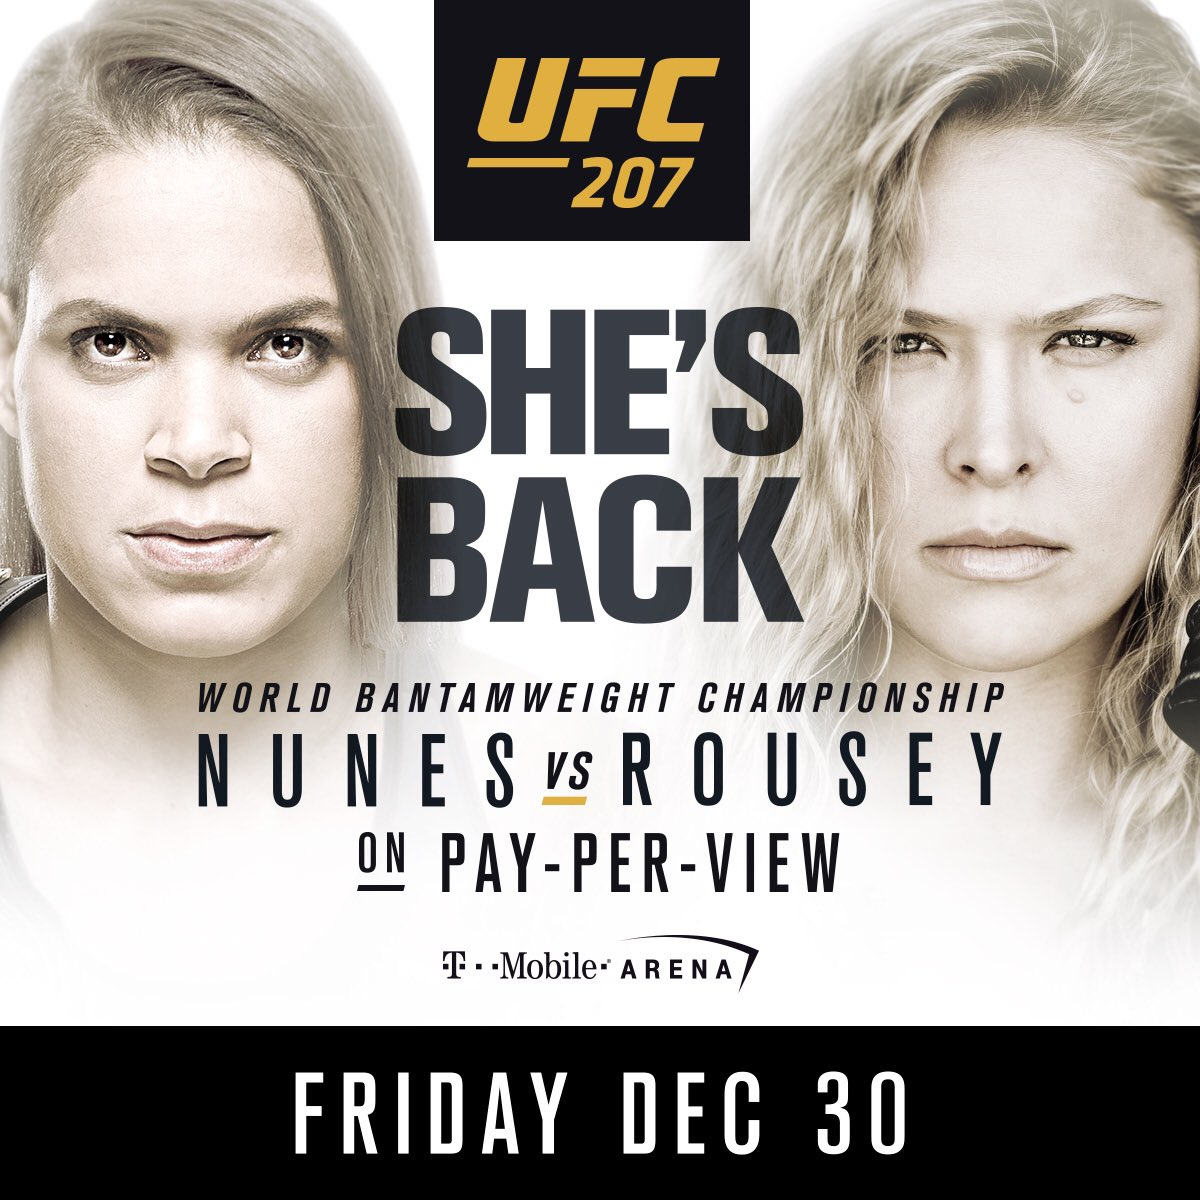 It's a girls night!! @Amanda_Leoa & @RondaRousey! This Friday Dec30!  #UFC207 https://t.co/1PGGPvaxvl